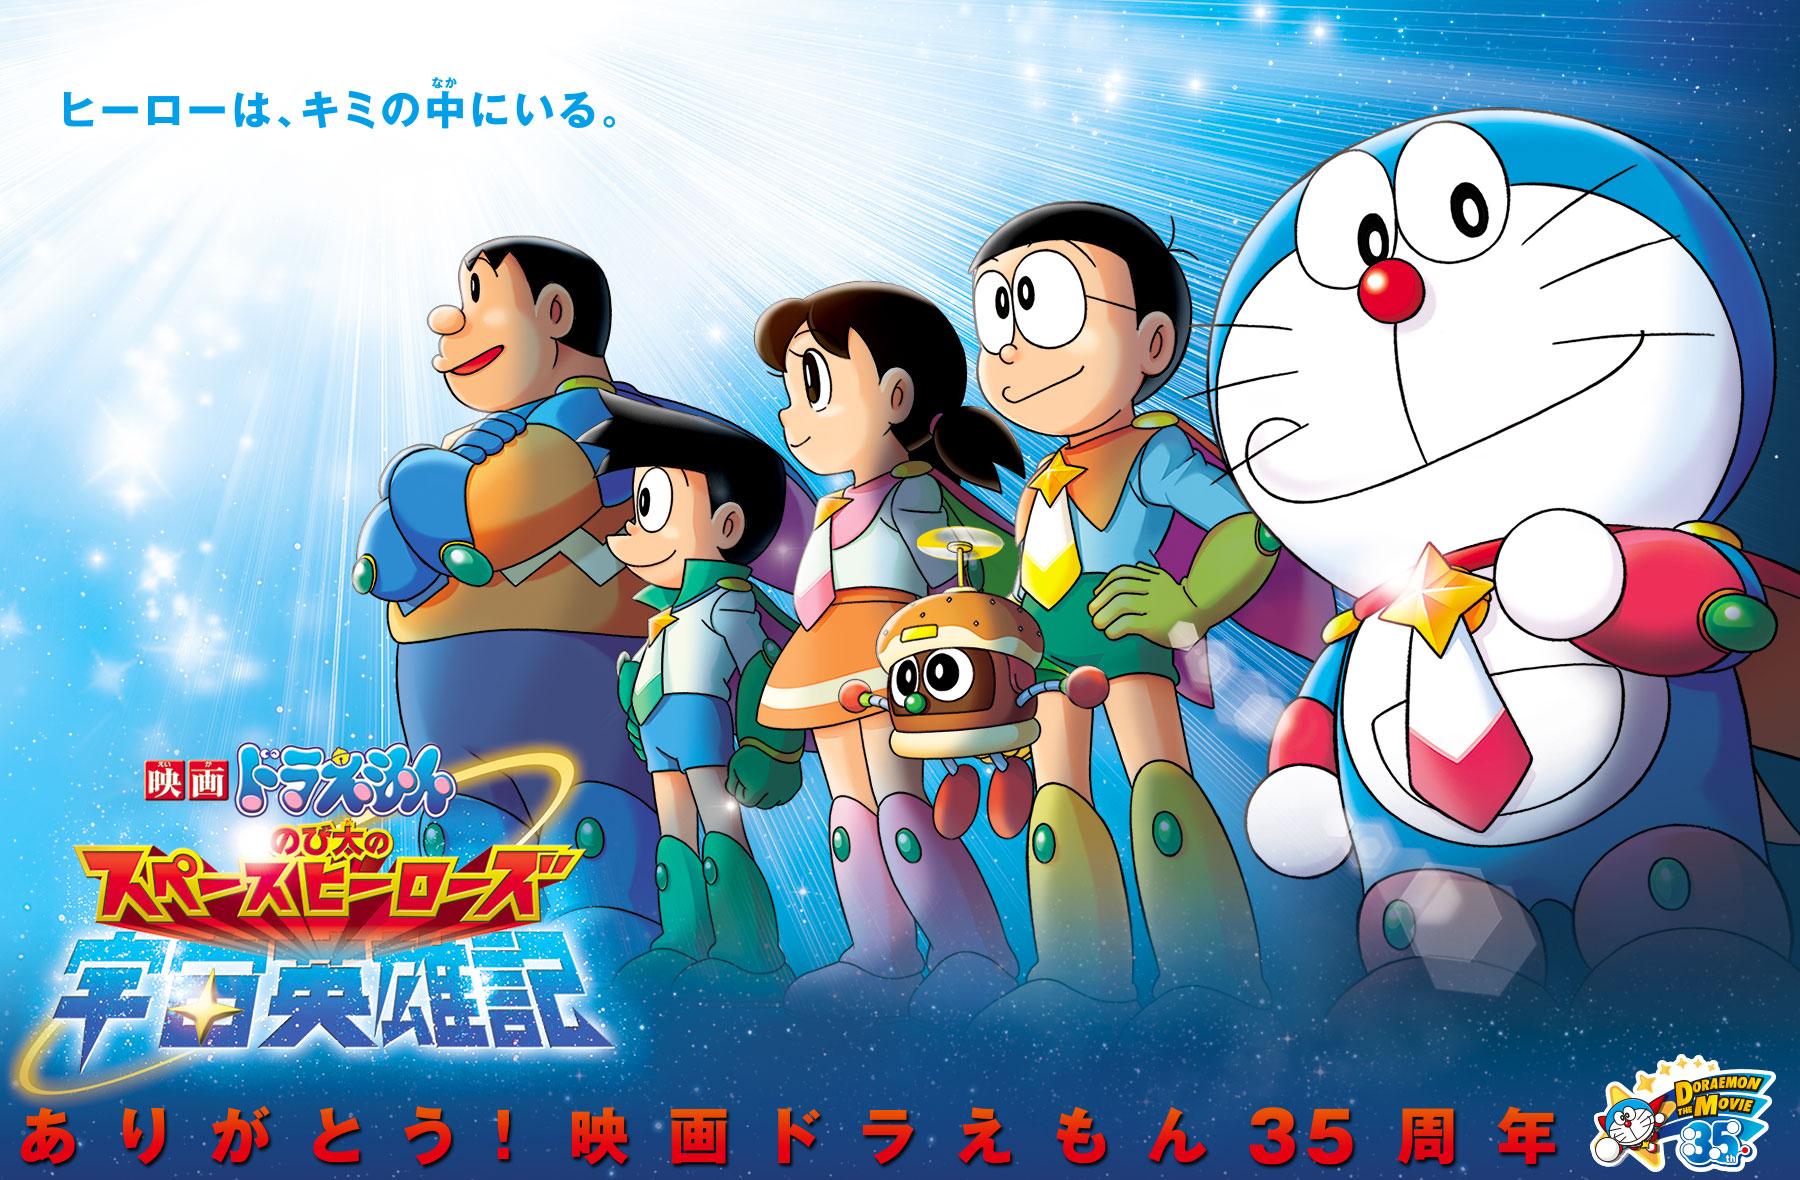 [Snow-Raws] 哆啦A梦剧场版:大雄的宇宙英雄记/Eiga Doraemon: Nobita no Space Heroes/映画ドラえもん のび太の宇宙英雄記 (BD 1920x1080 HEVC-YUV420P10 FLAC)